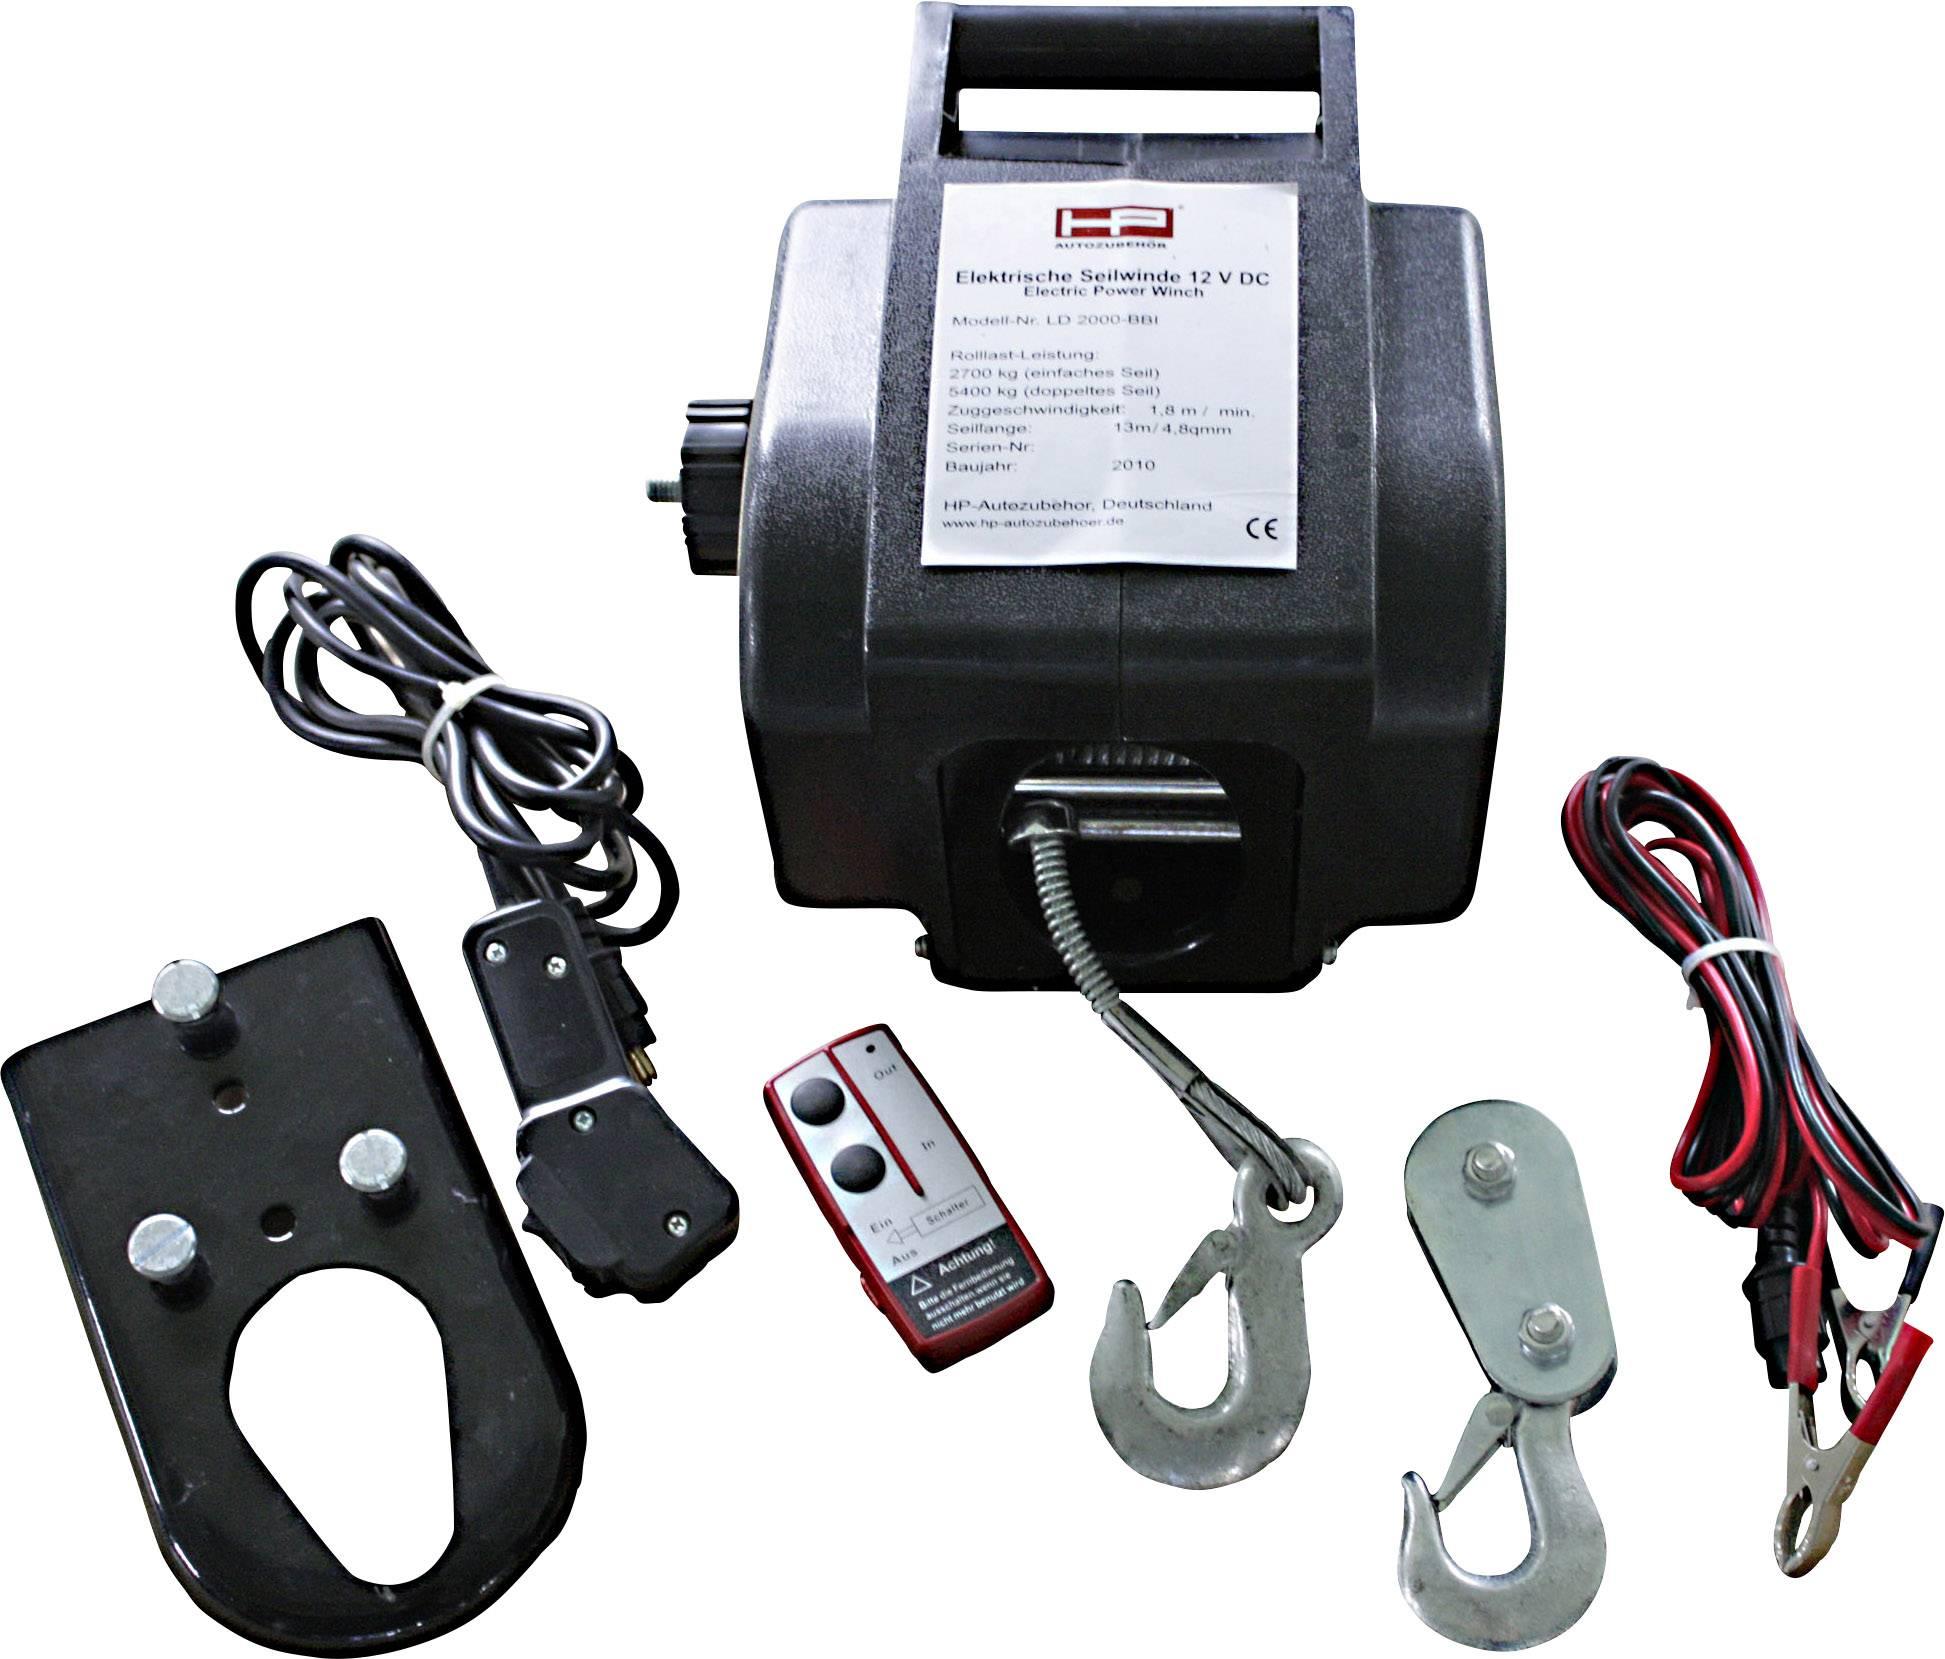 Unika HP Autozubehör Vinsch 20604 Dragkraft (stående)=900 kg Dragkraft LP-67